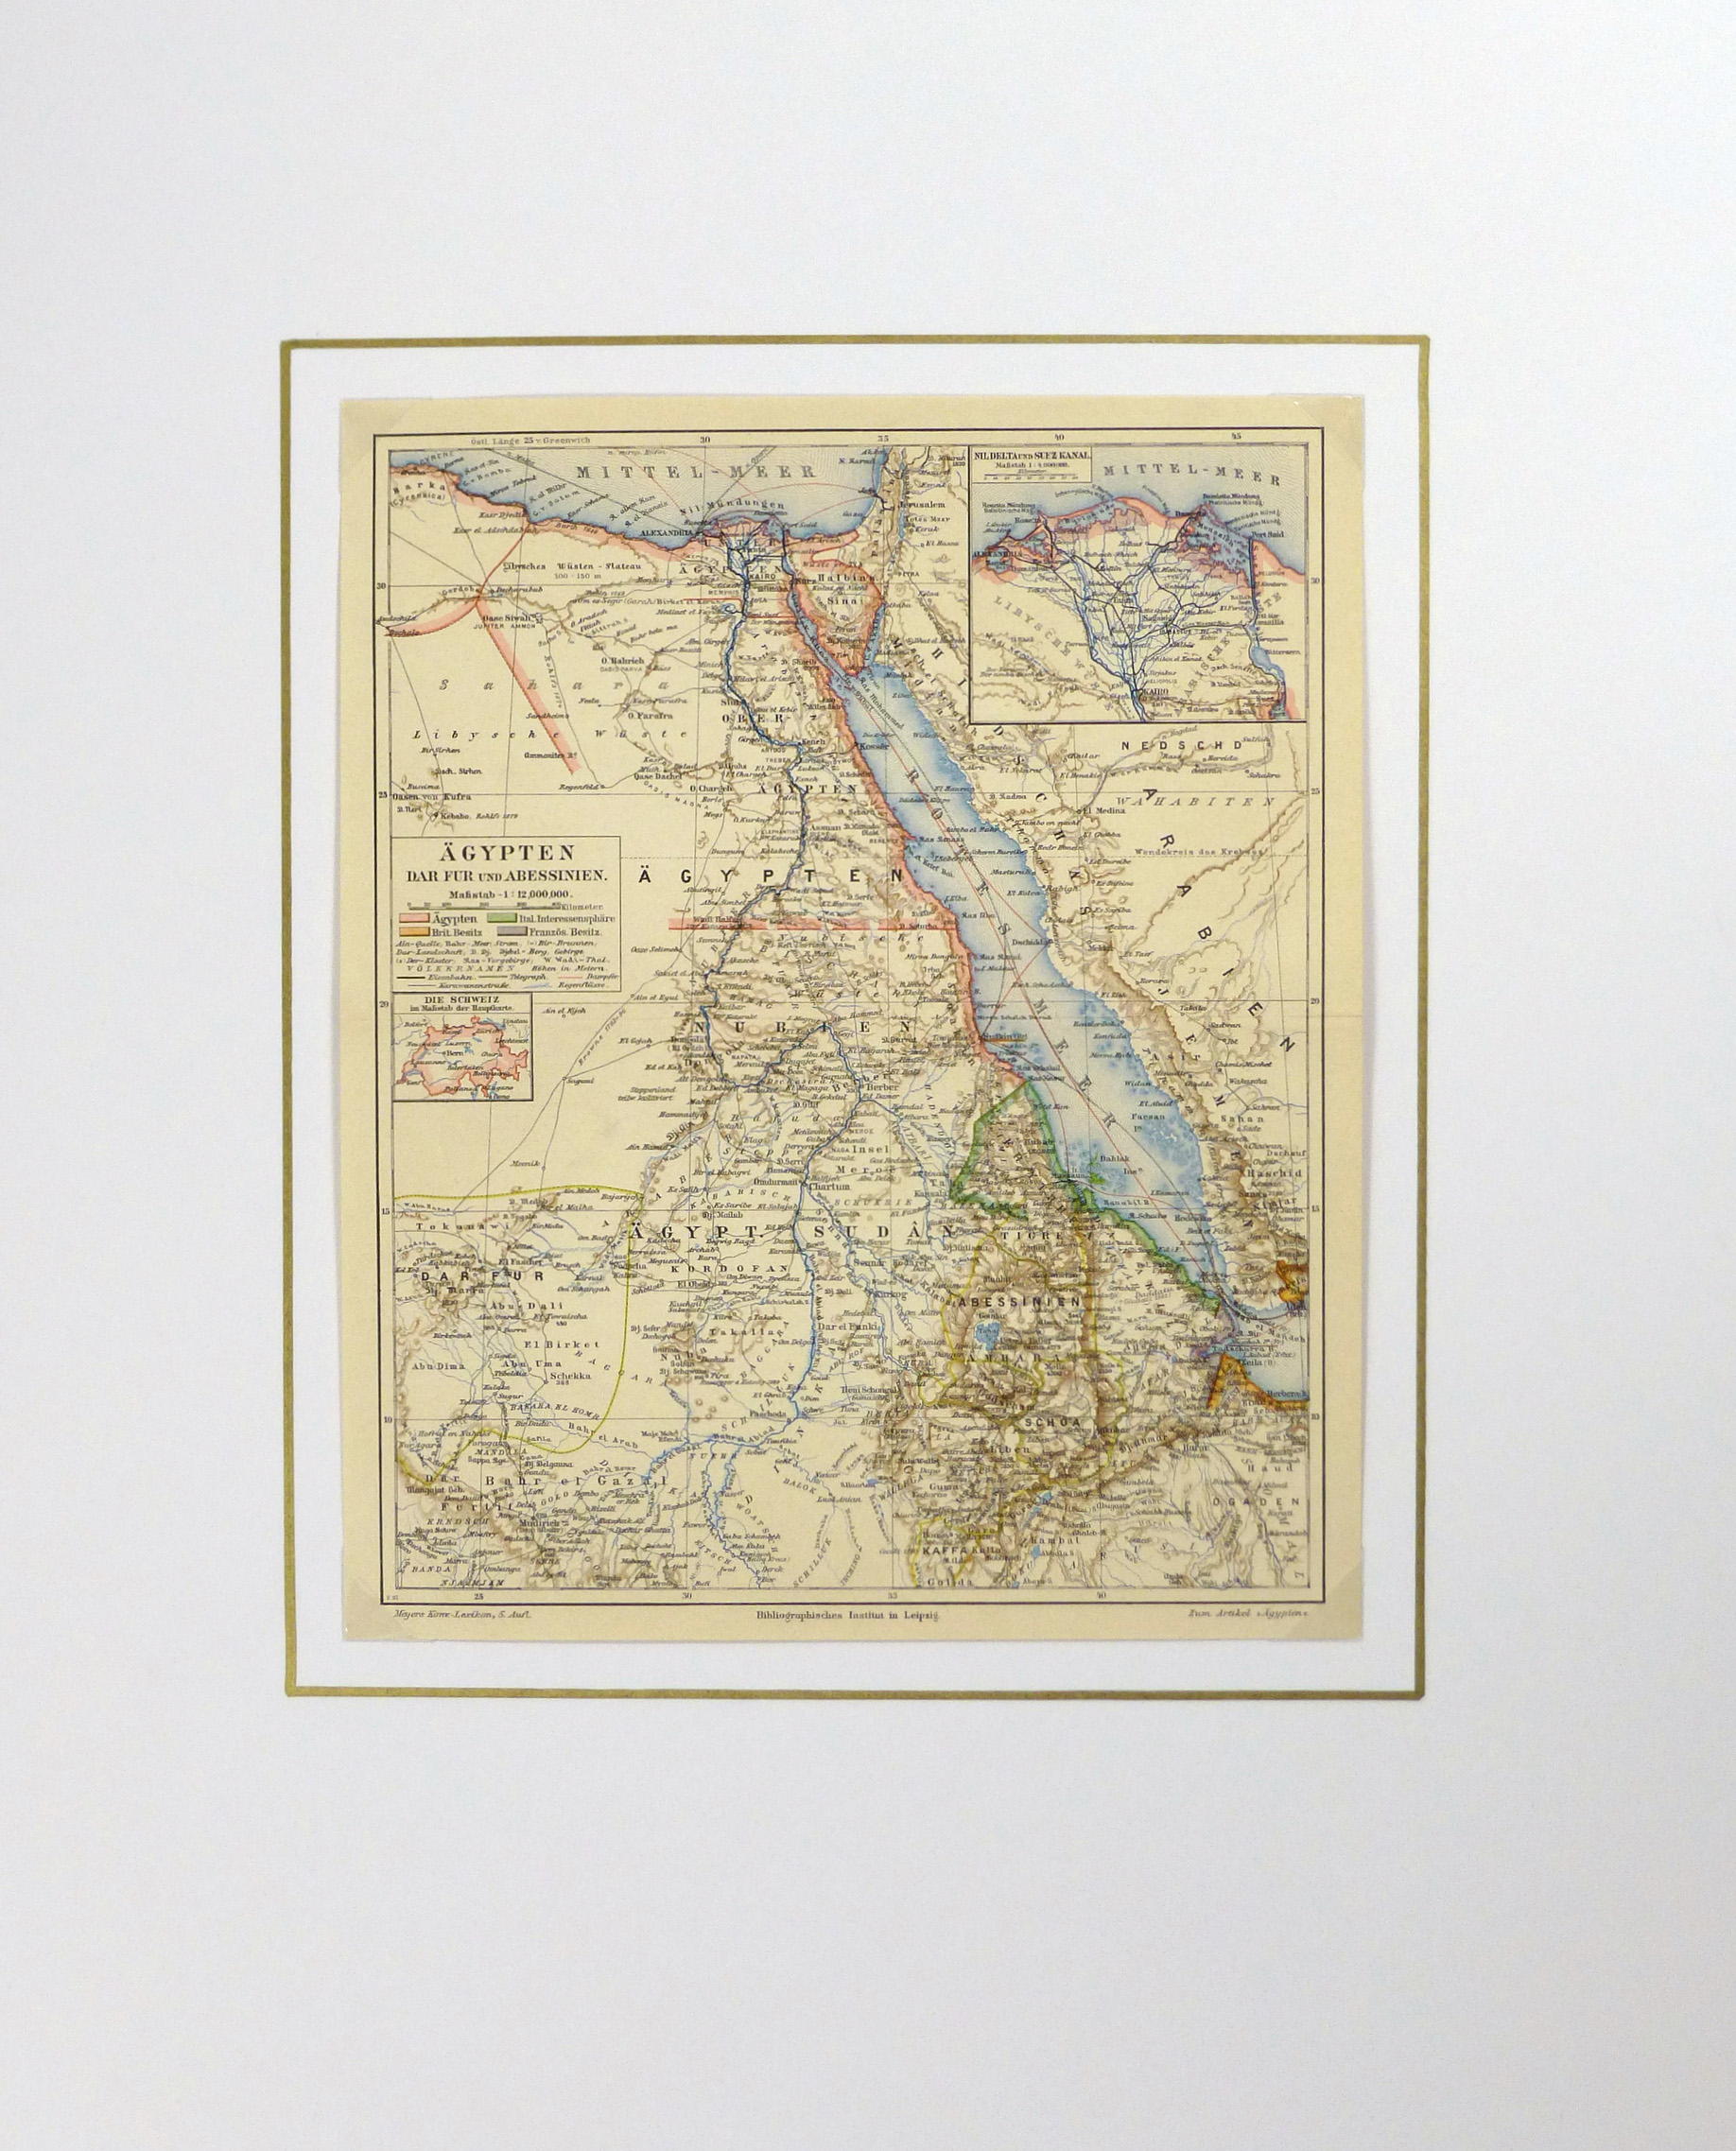 Egypt, Sudan & Ethiopia Map, Circa 1880-matted-5791K